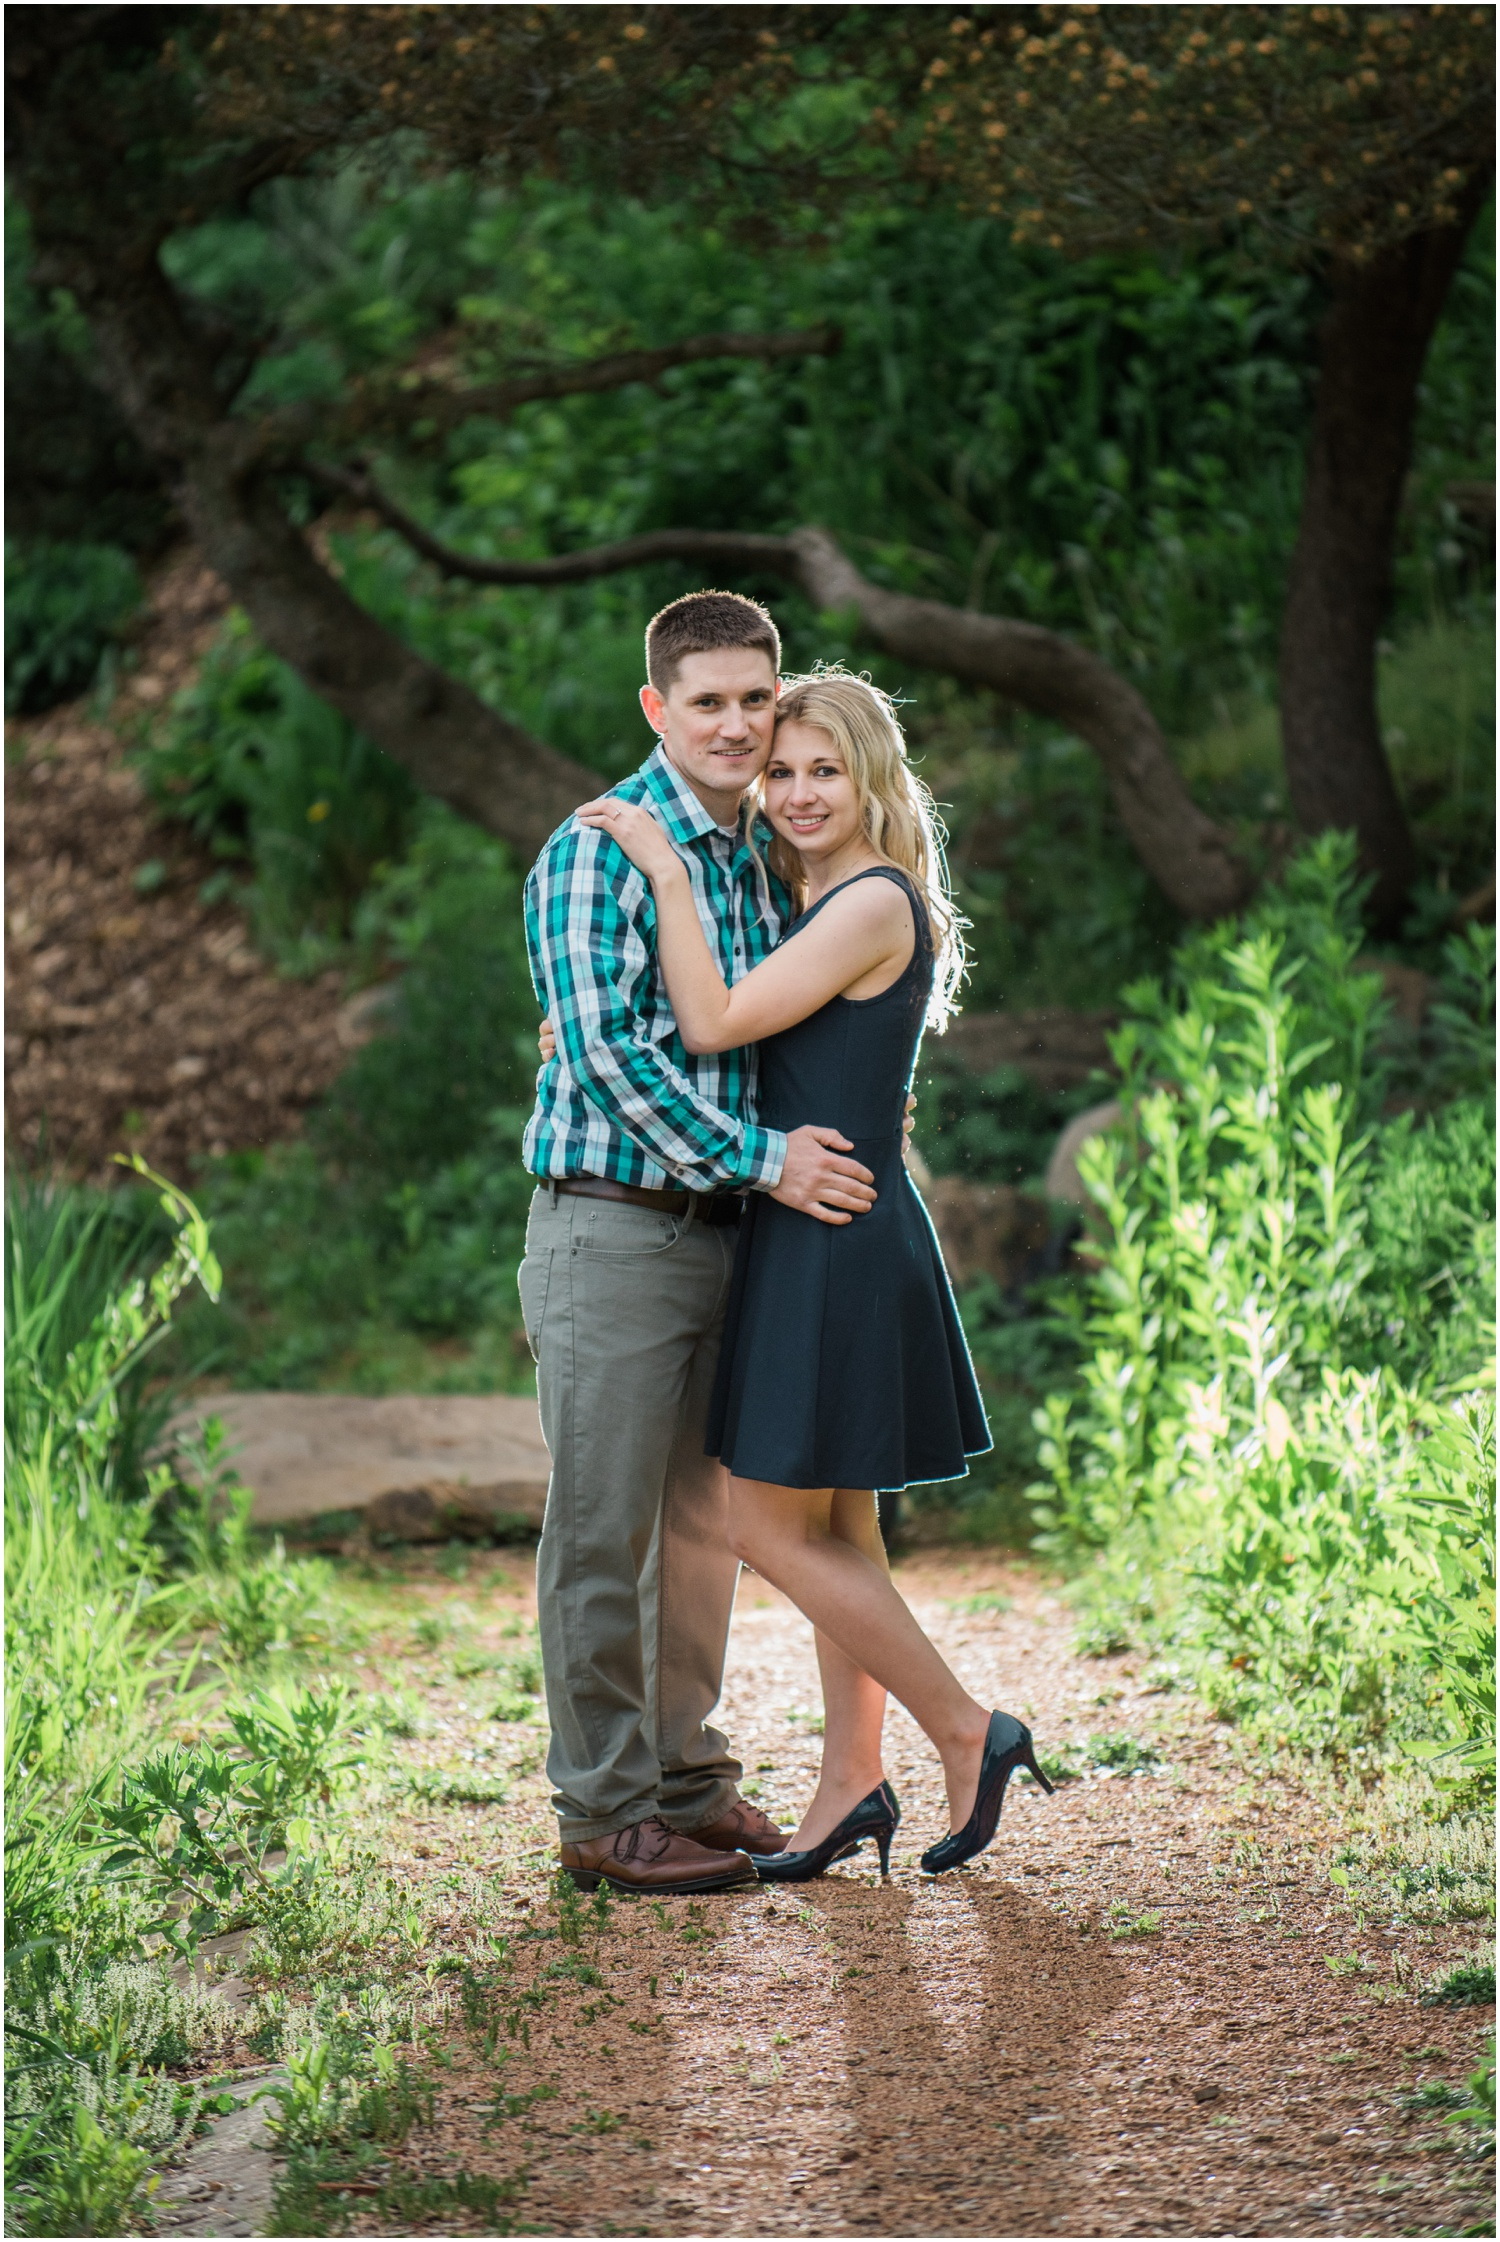 Paquette_Park_Portage_WI_Engagement_Photos_Heather_and_Derek_0030.jpg